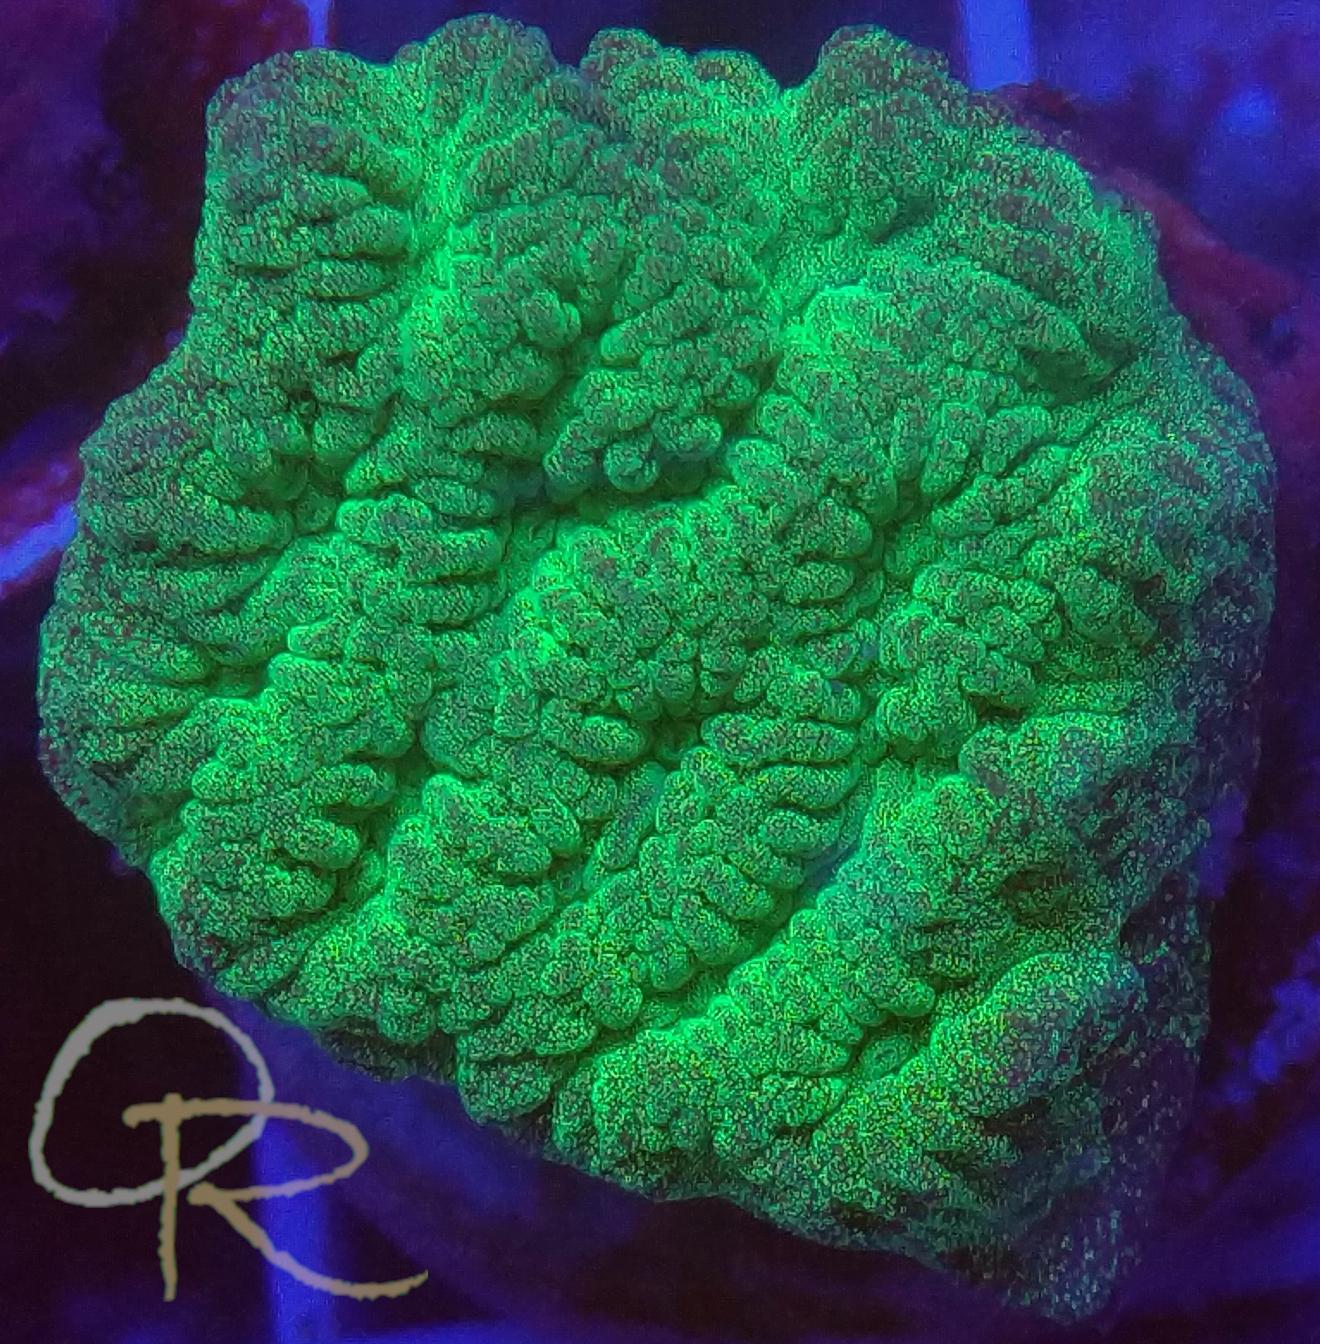 Ruffled Coral (Merulina sp.) – Ultra Green